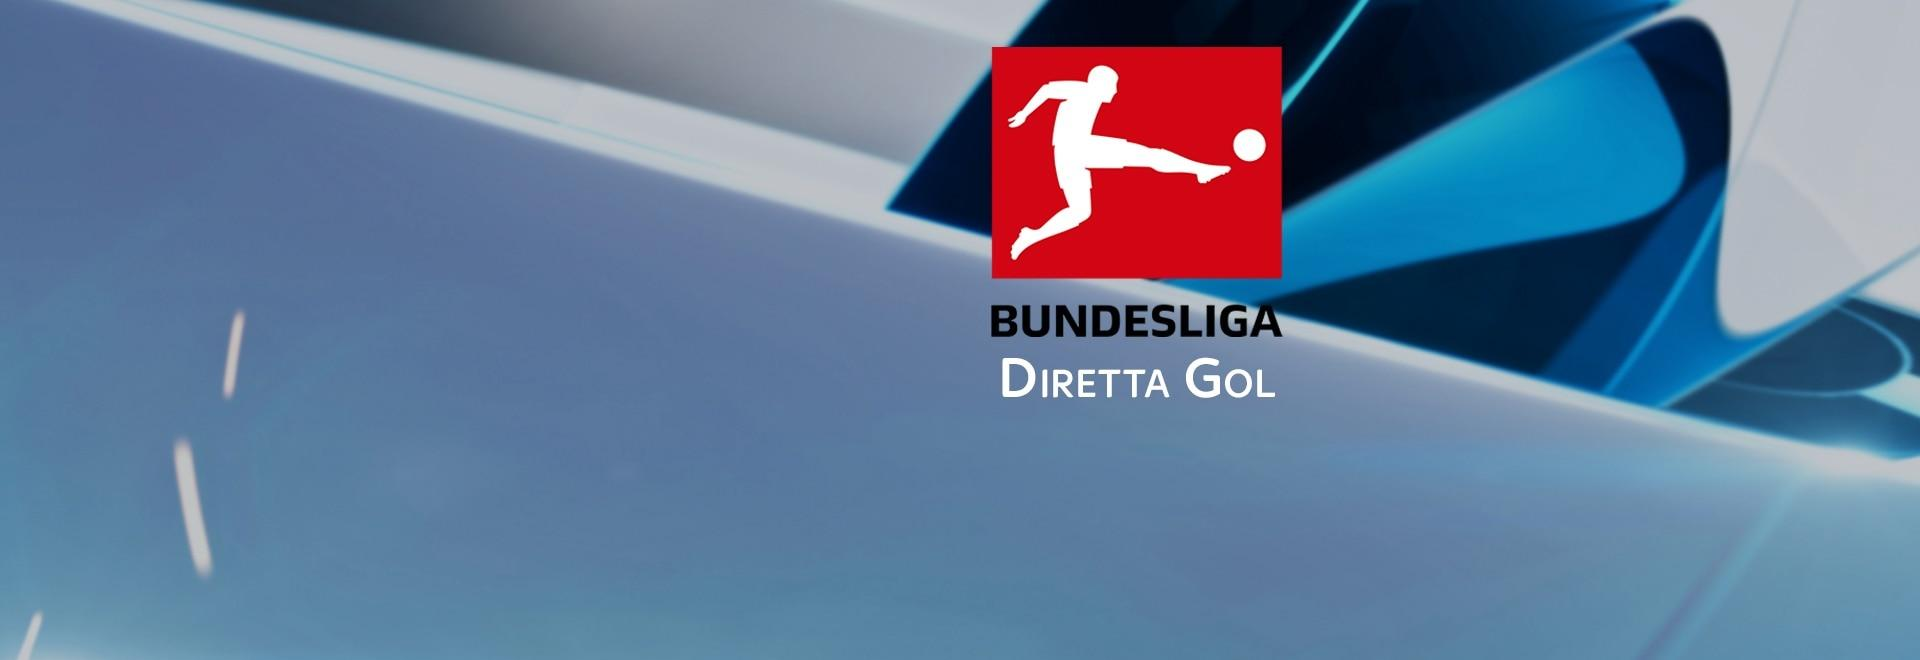 Diretta Gol Bundesliga Sky